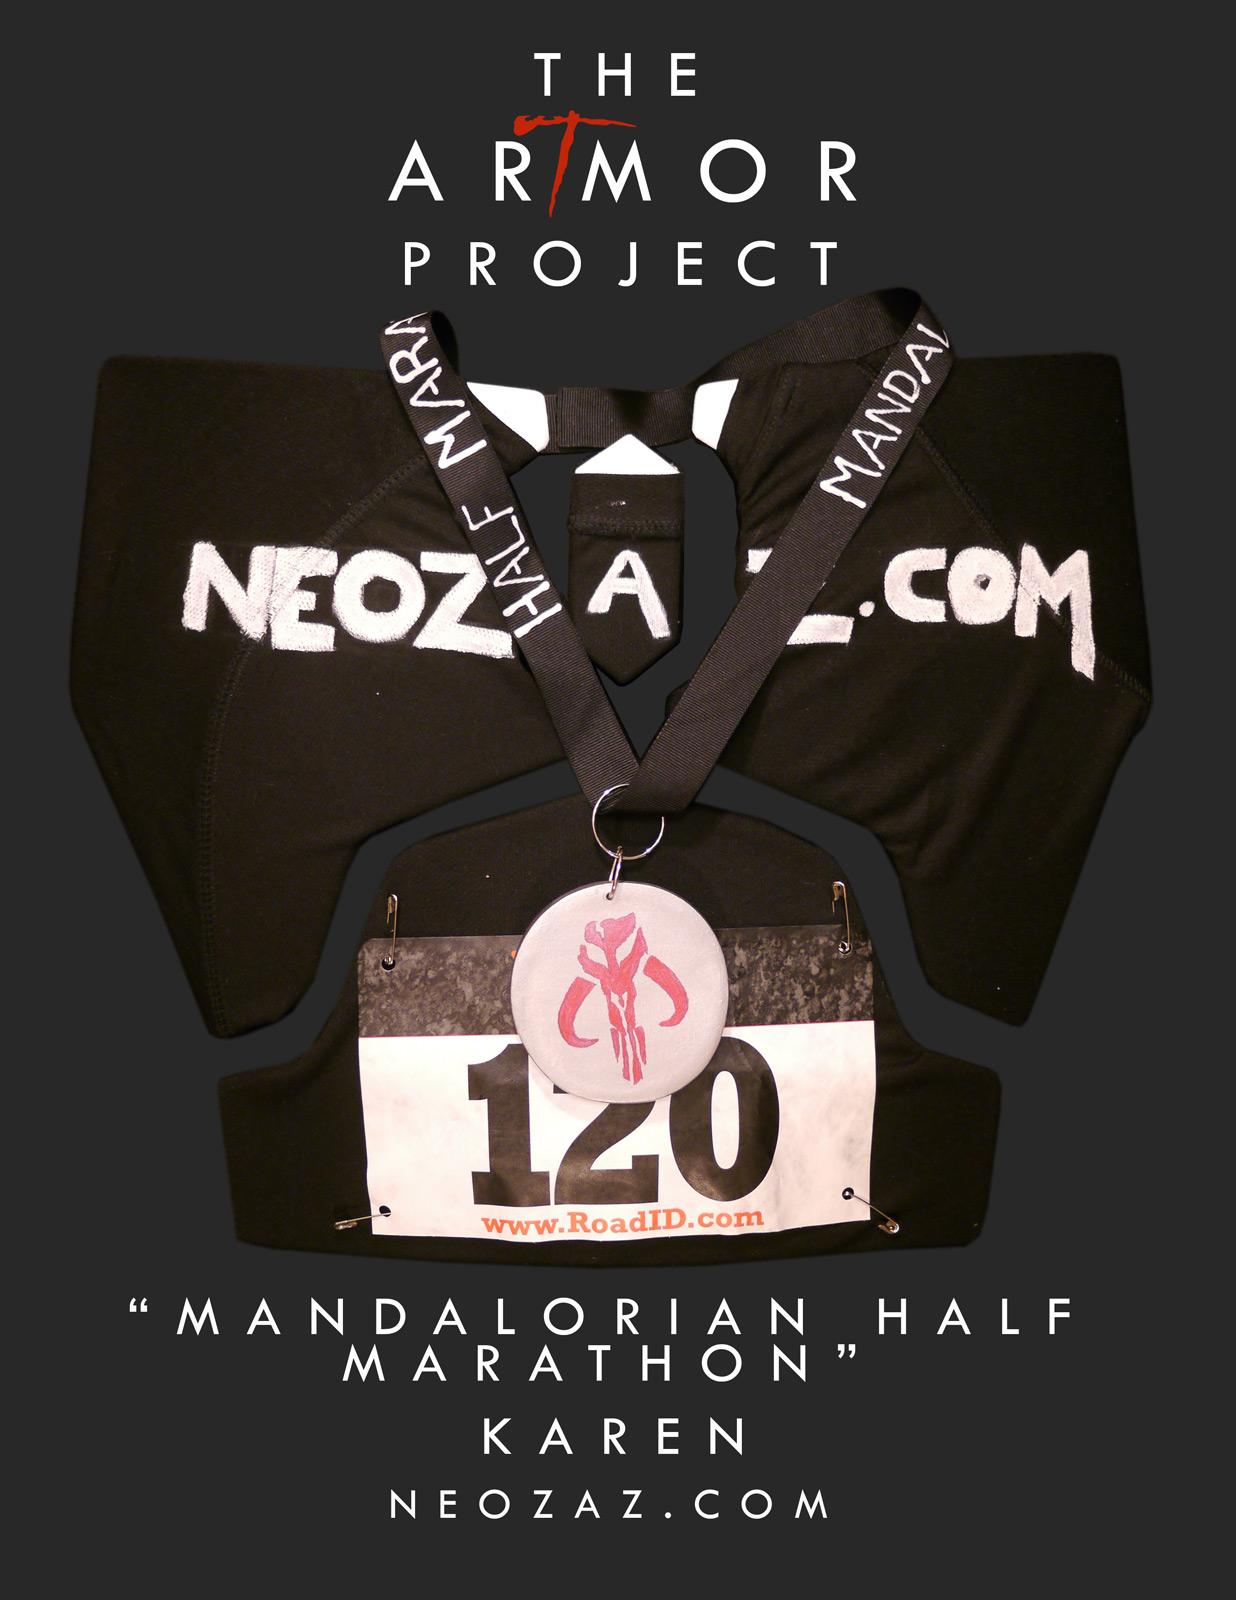 ArTmor 2015: Mandalorian Half Marathon